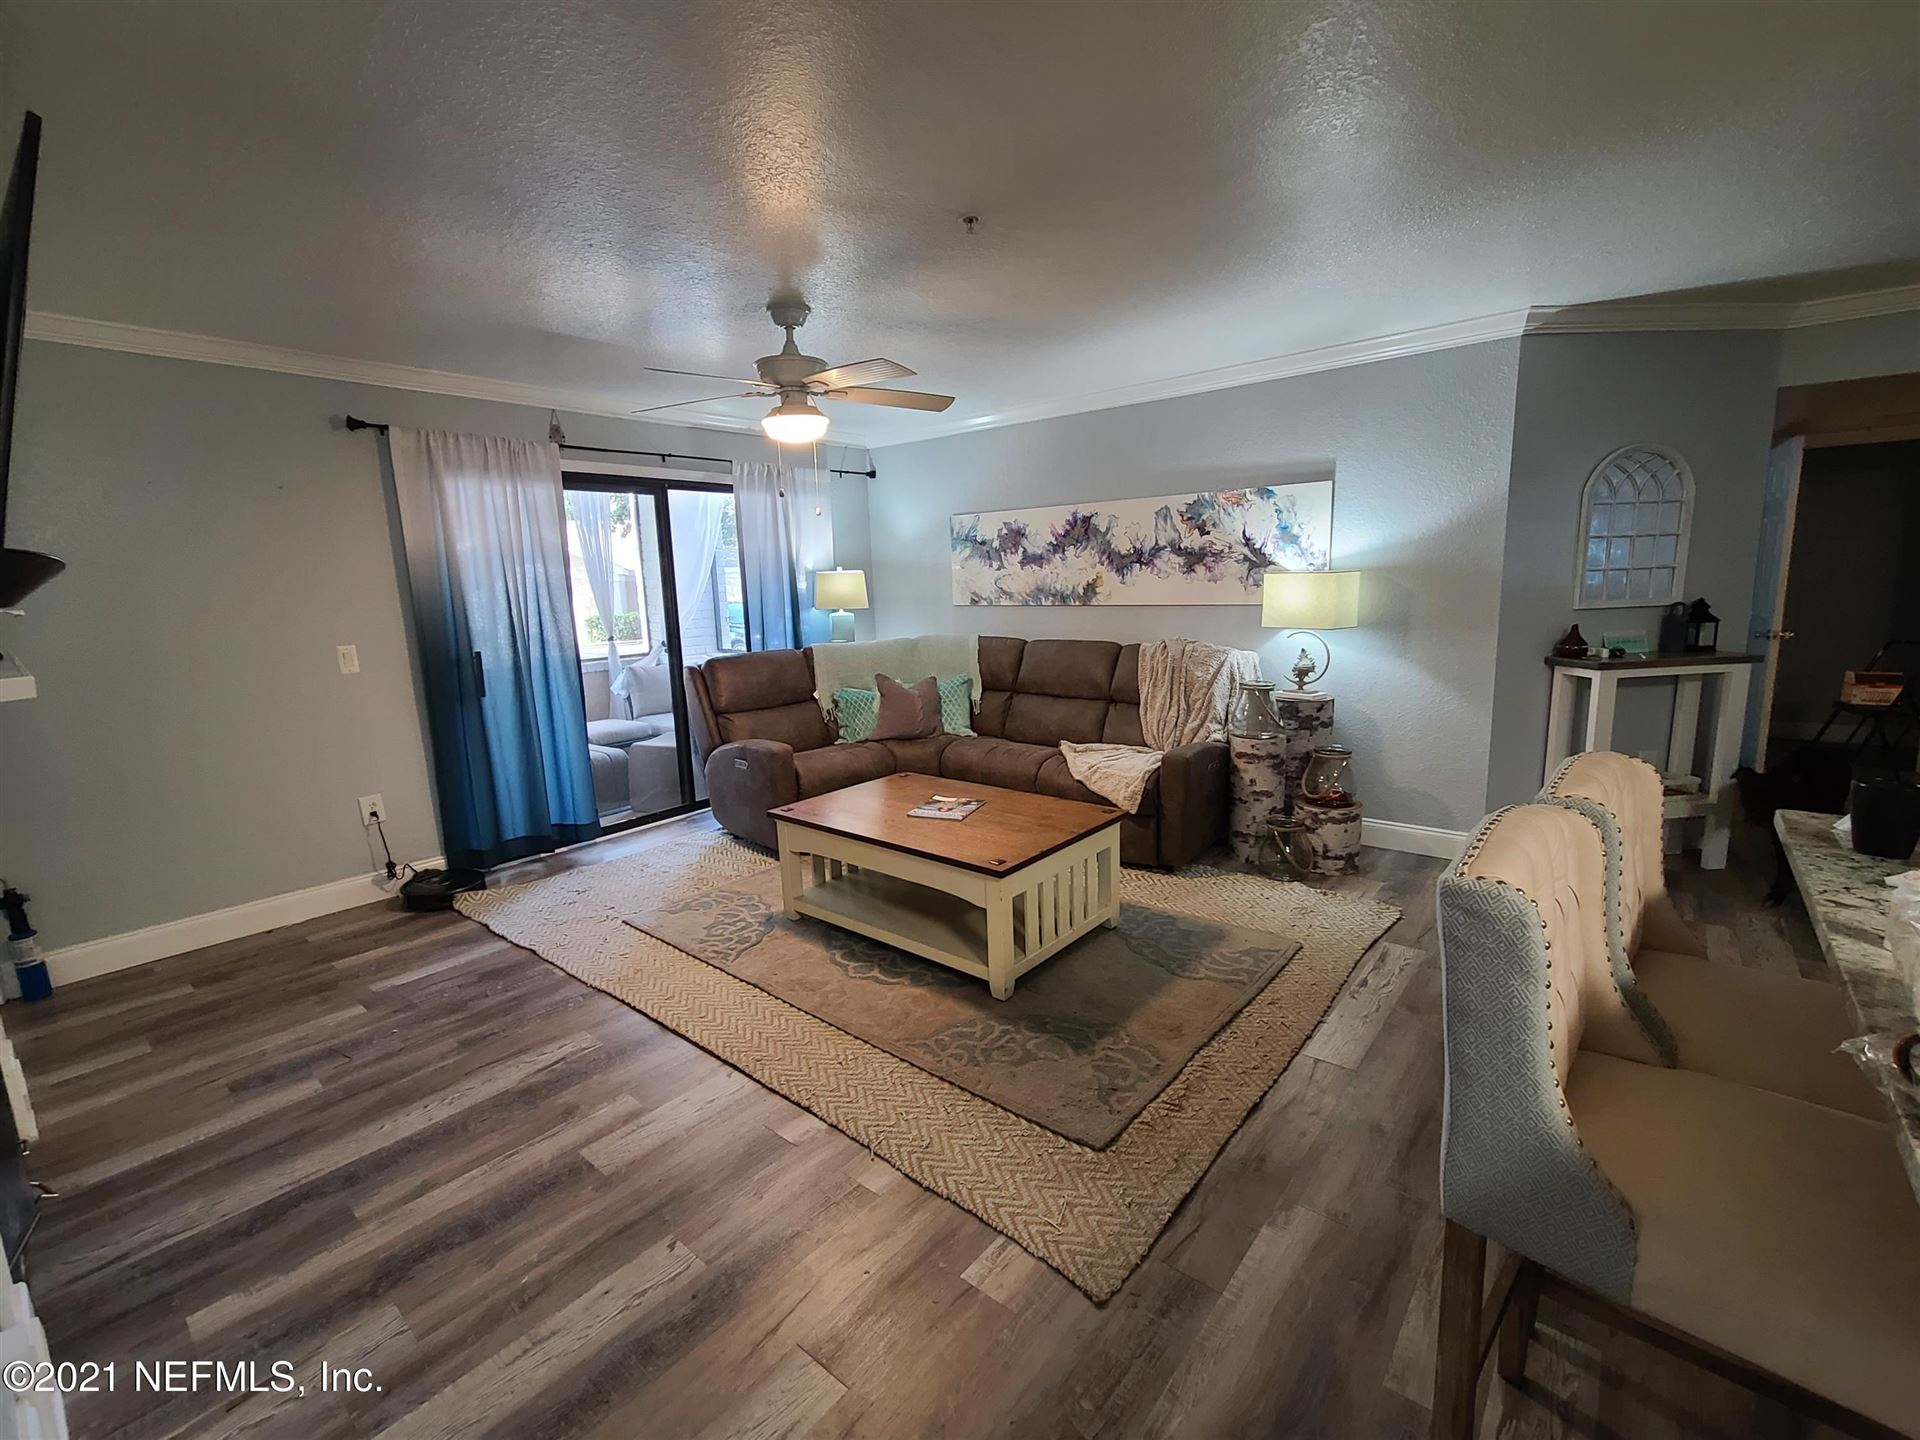 425 TIMBERWALK CT #Unit No: 1112, Ponte Vedra Beach, FL 32082 - MLS#: 1107874